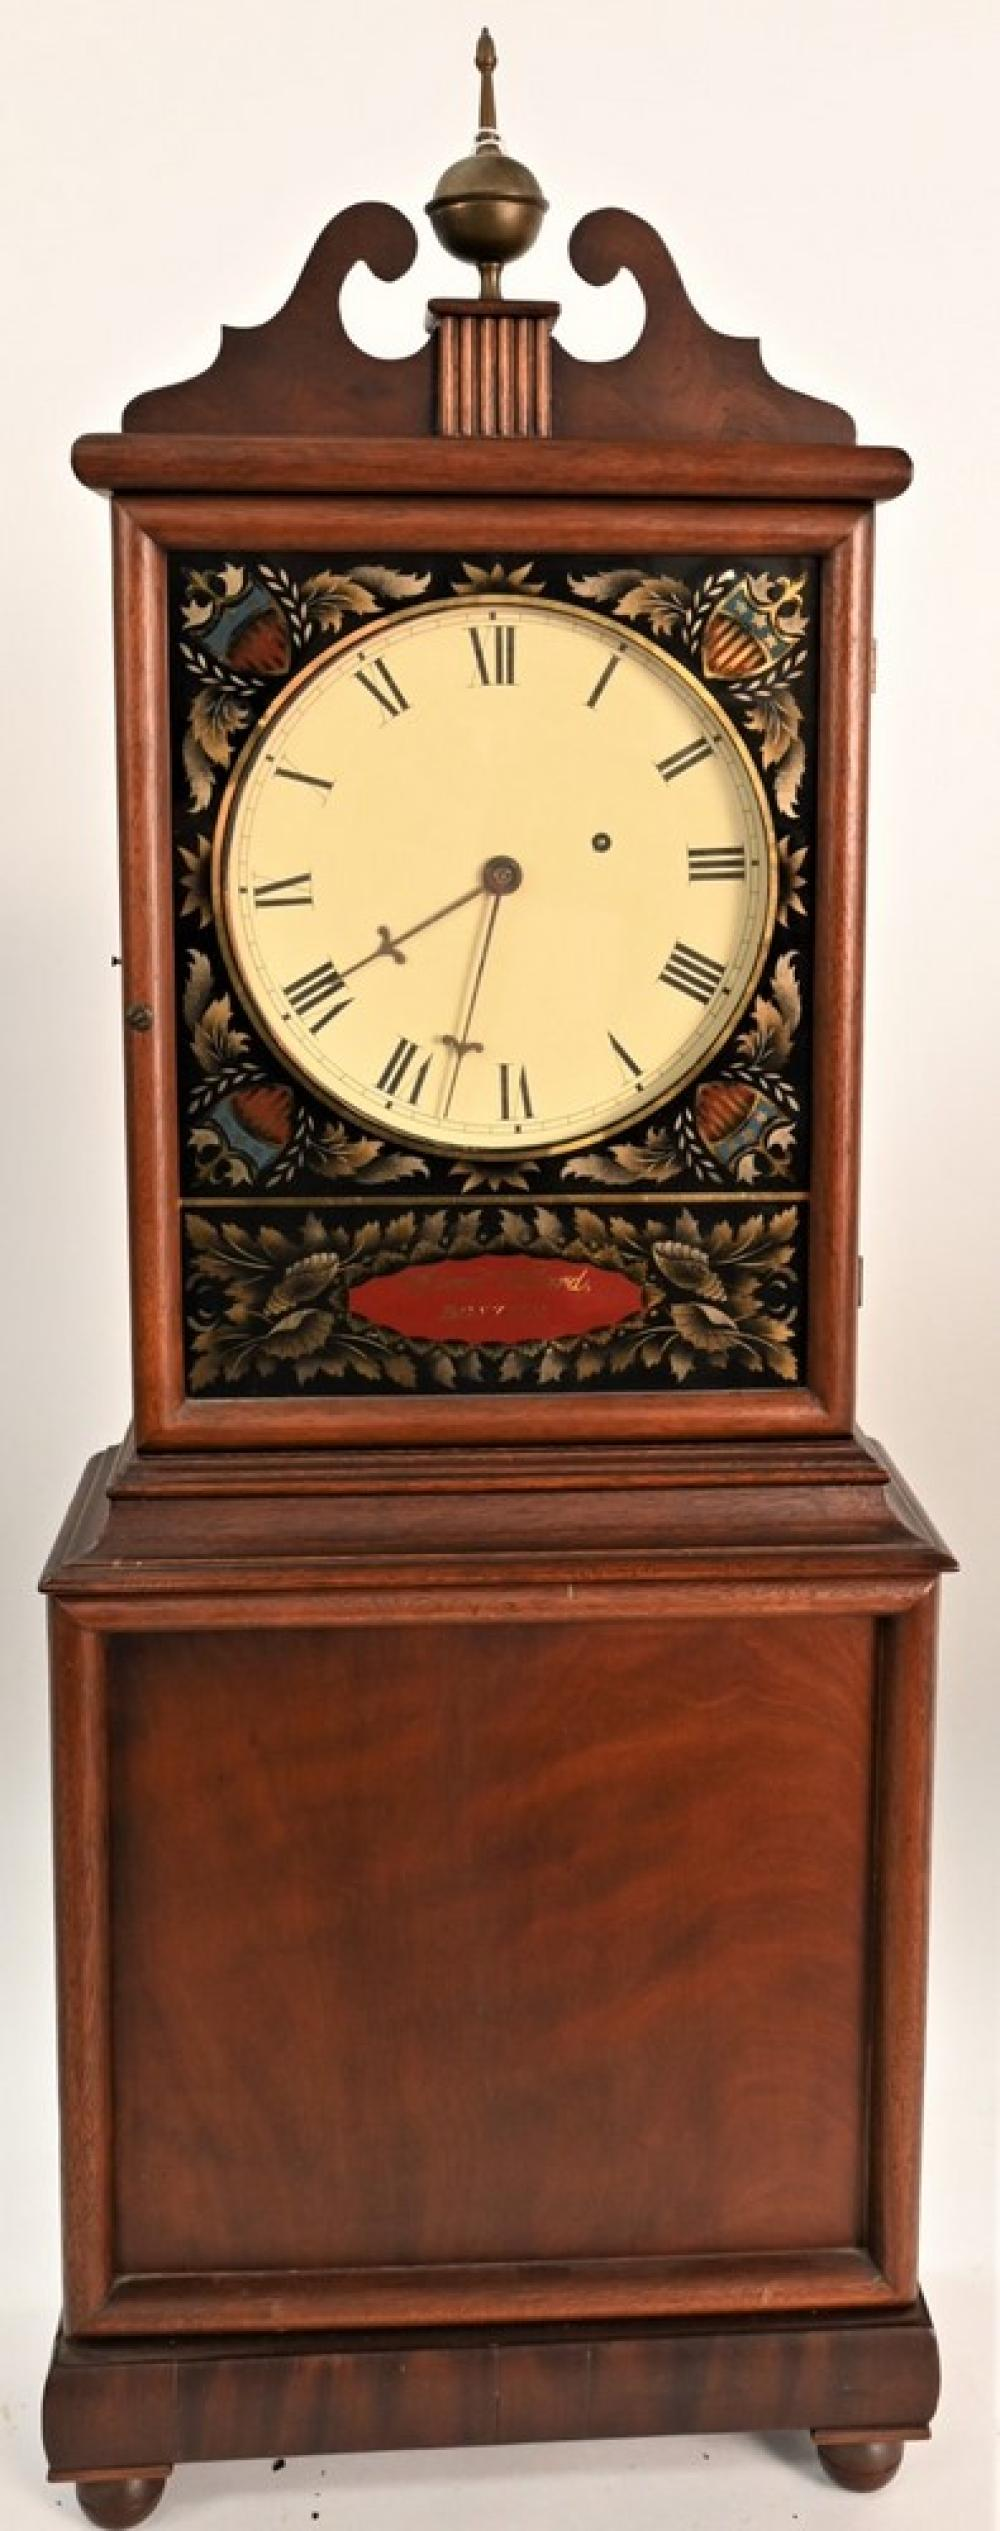 "Aaron Willard Mahogany Shelf Clockhaving eglomised dial maskfeatures a reserve signed ""Aaron Willard Boston"" on ball feetcase rew..."